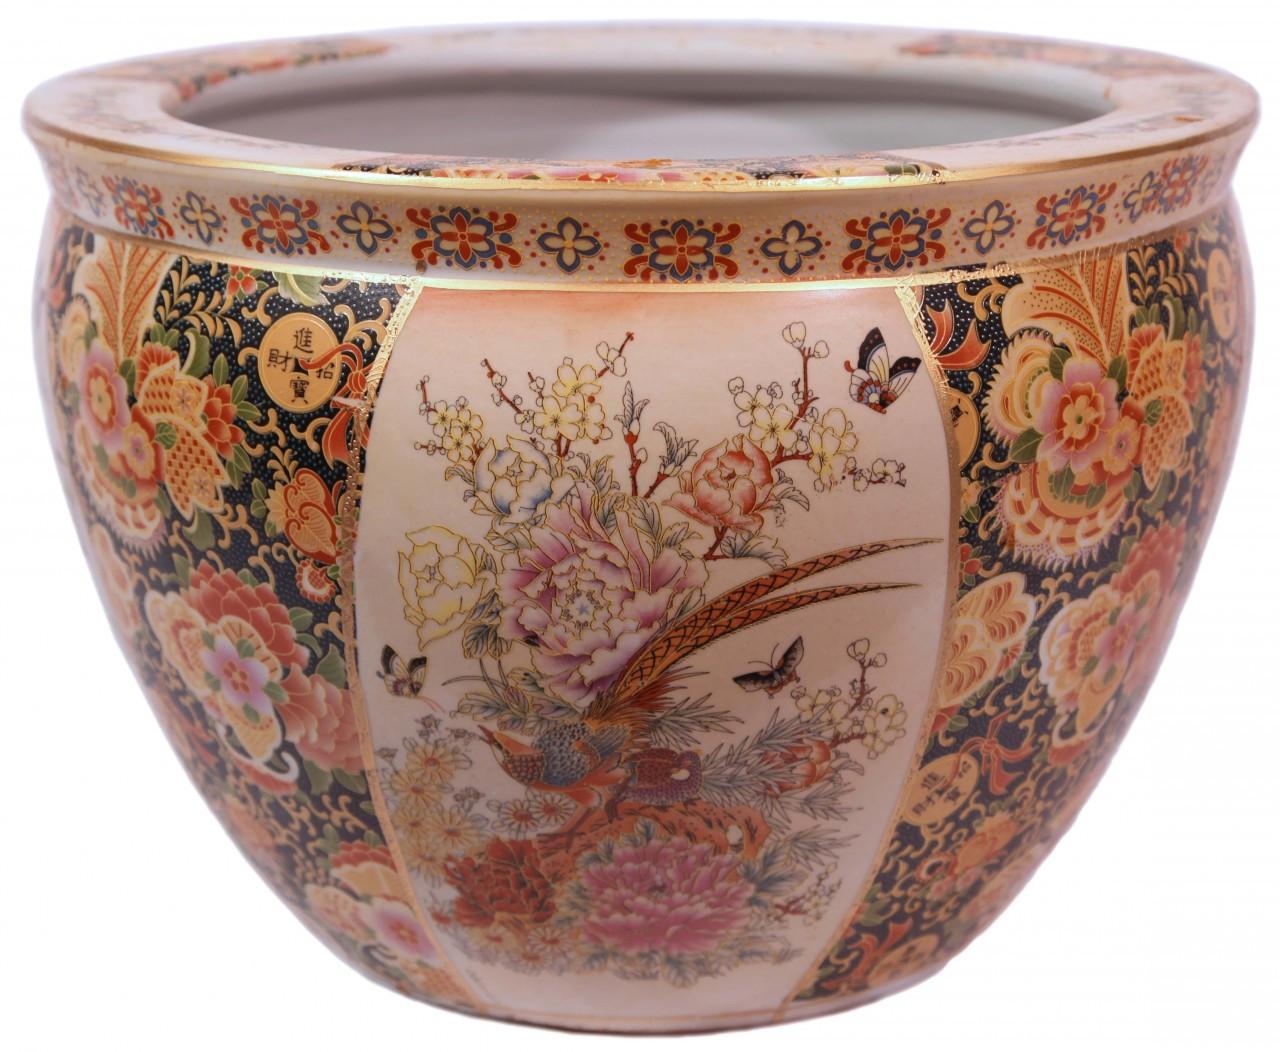 Chinese Porcelain Fish Bowl Planters Satsuma Pheasant